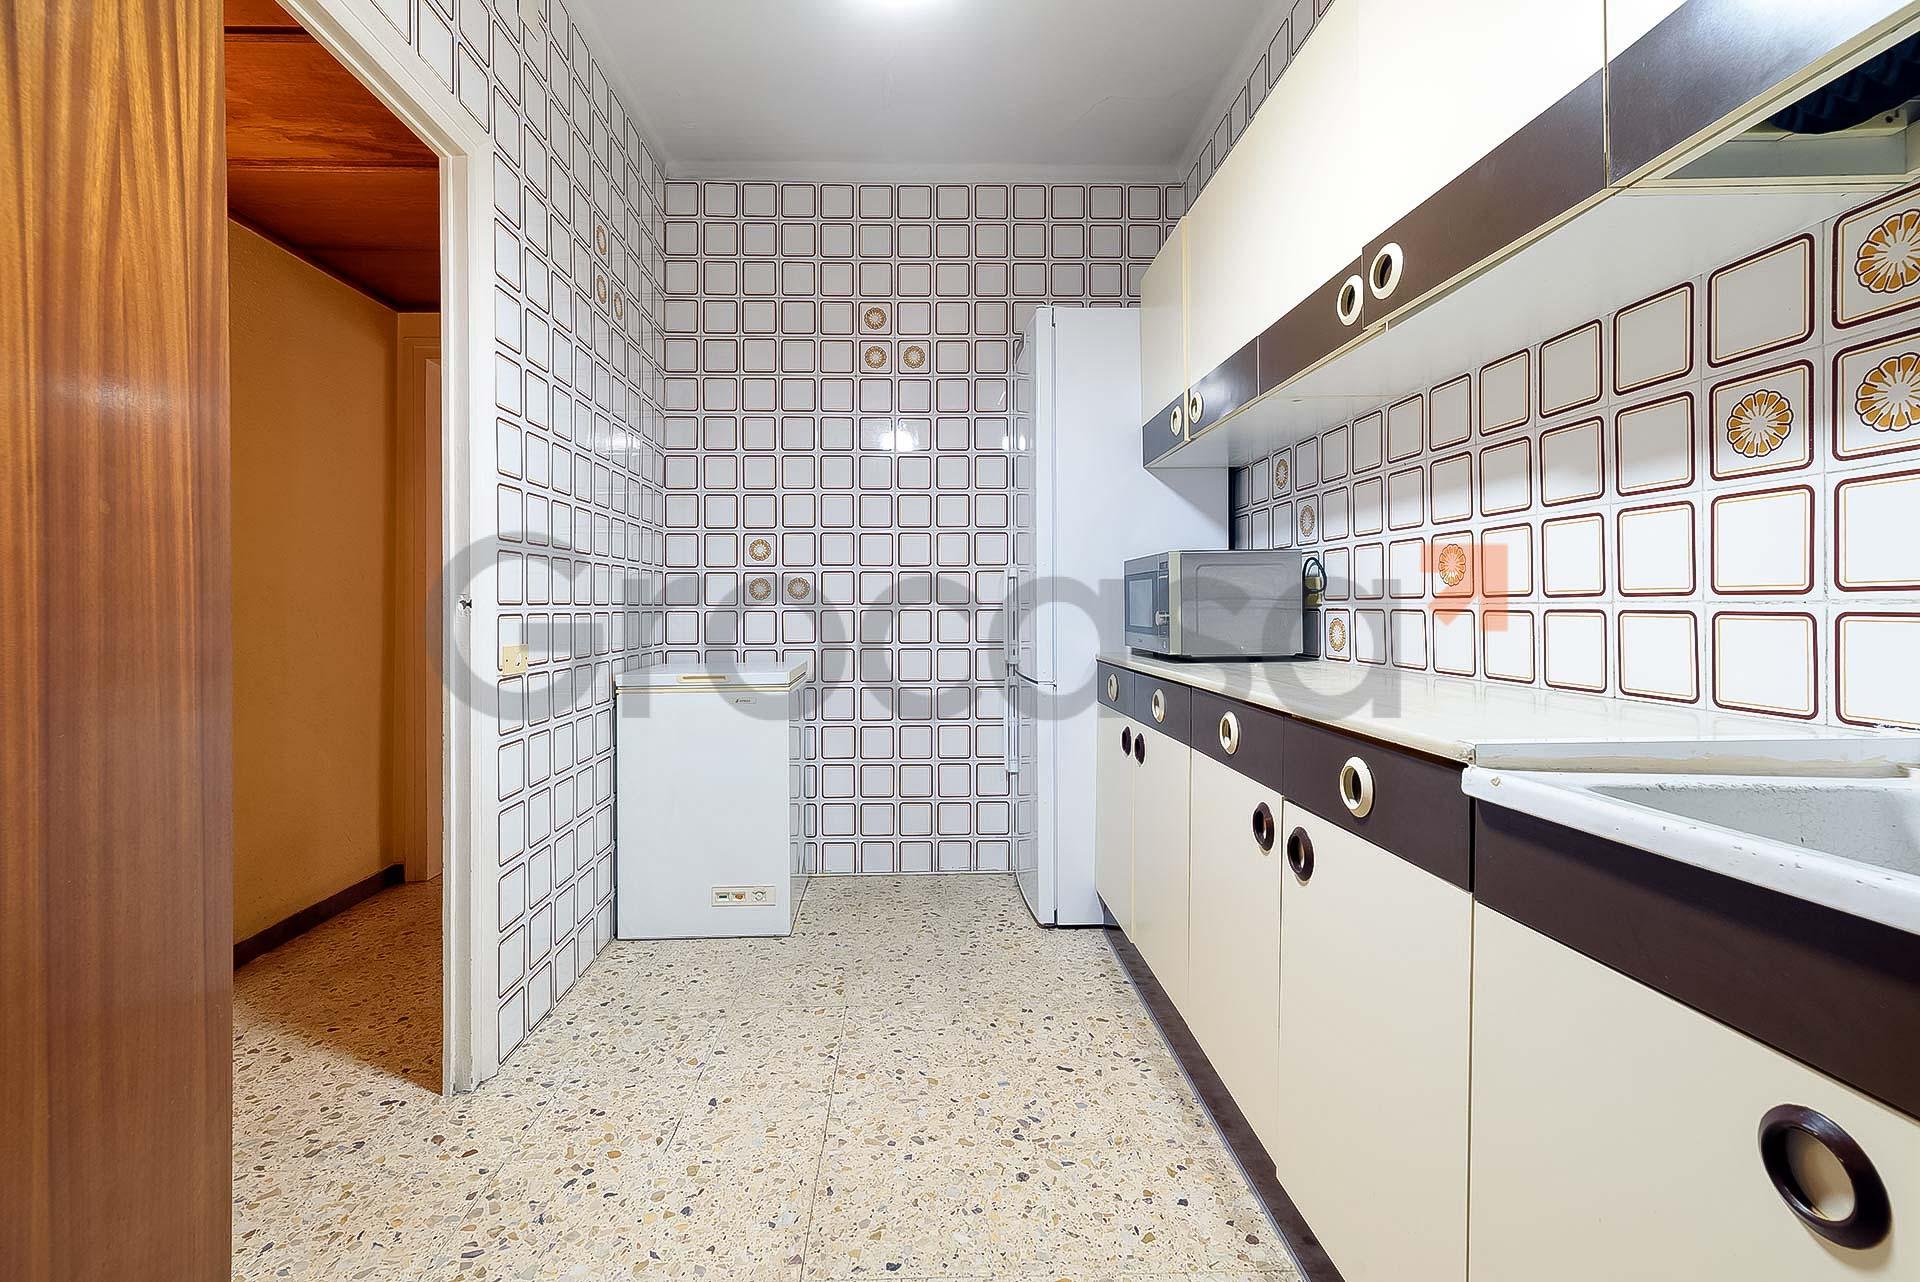 Piso en Sant Boi de Llobregat en Venta por 199.000€